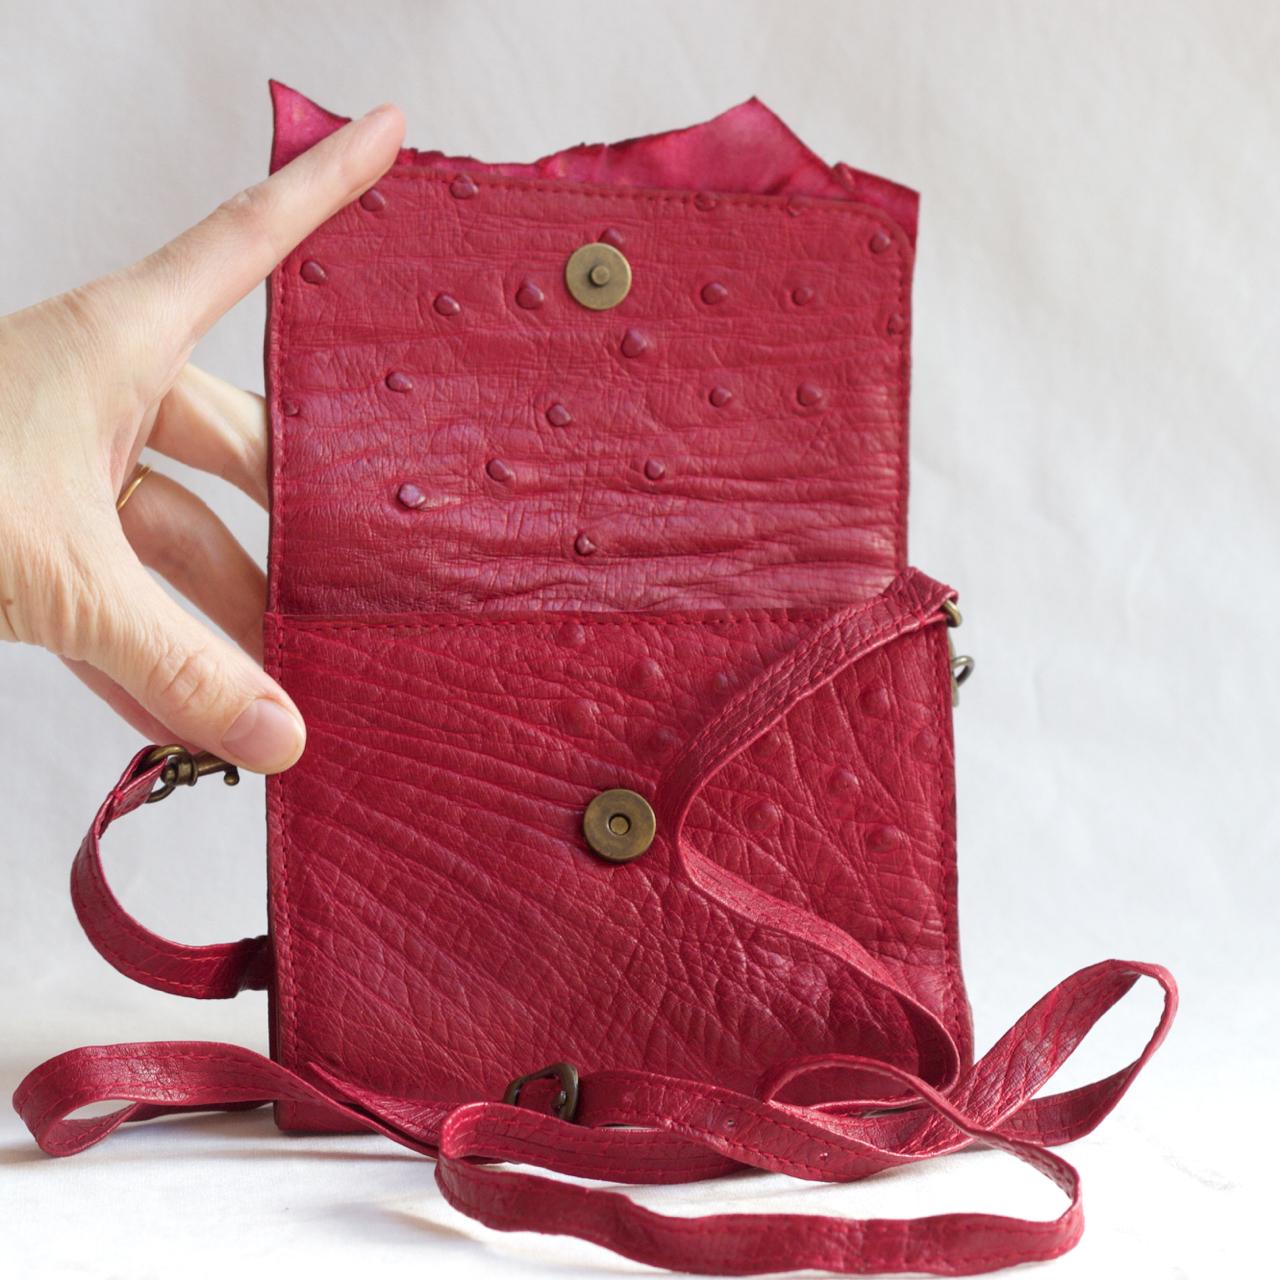 Punane kott jaanalinnunahast